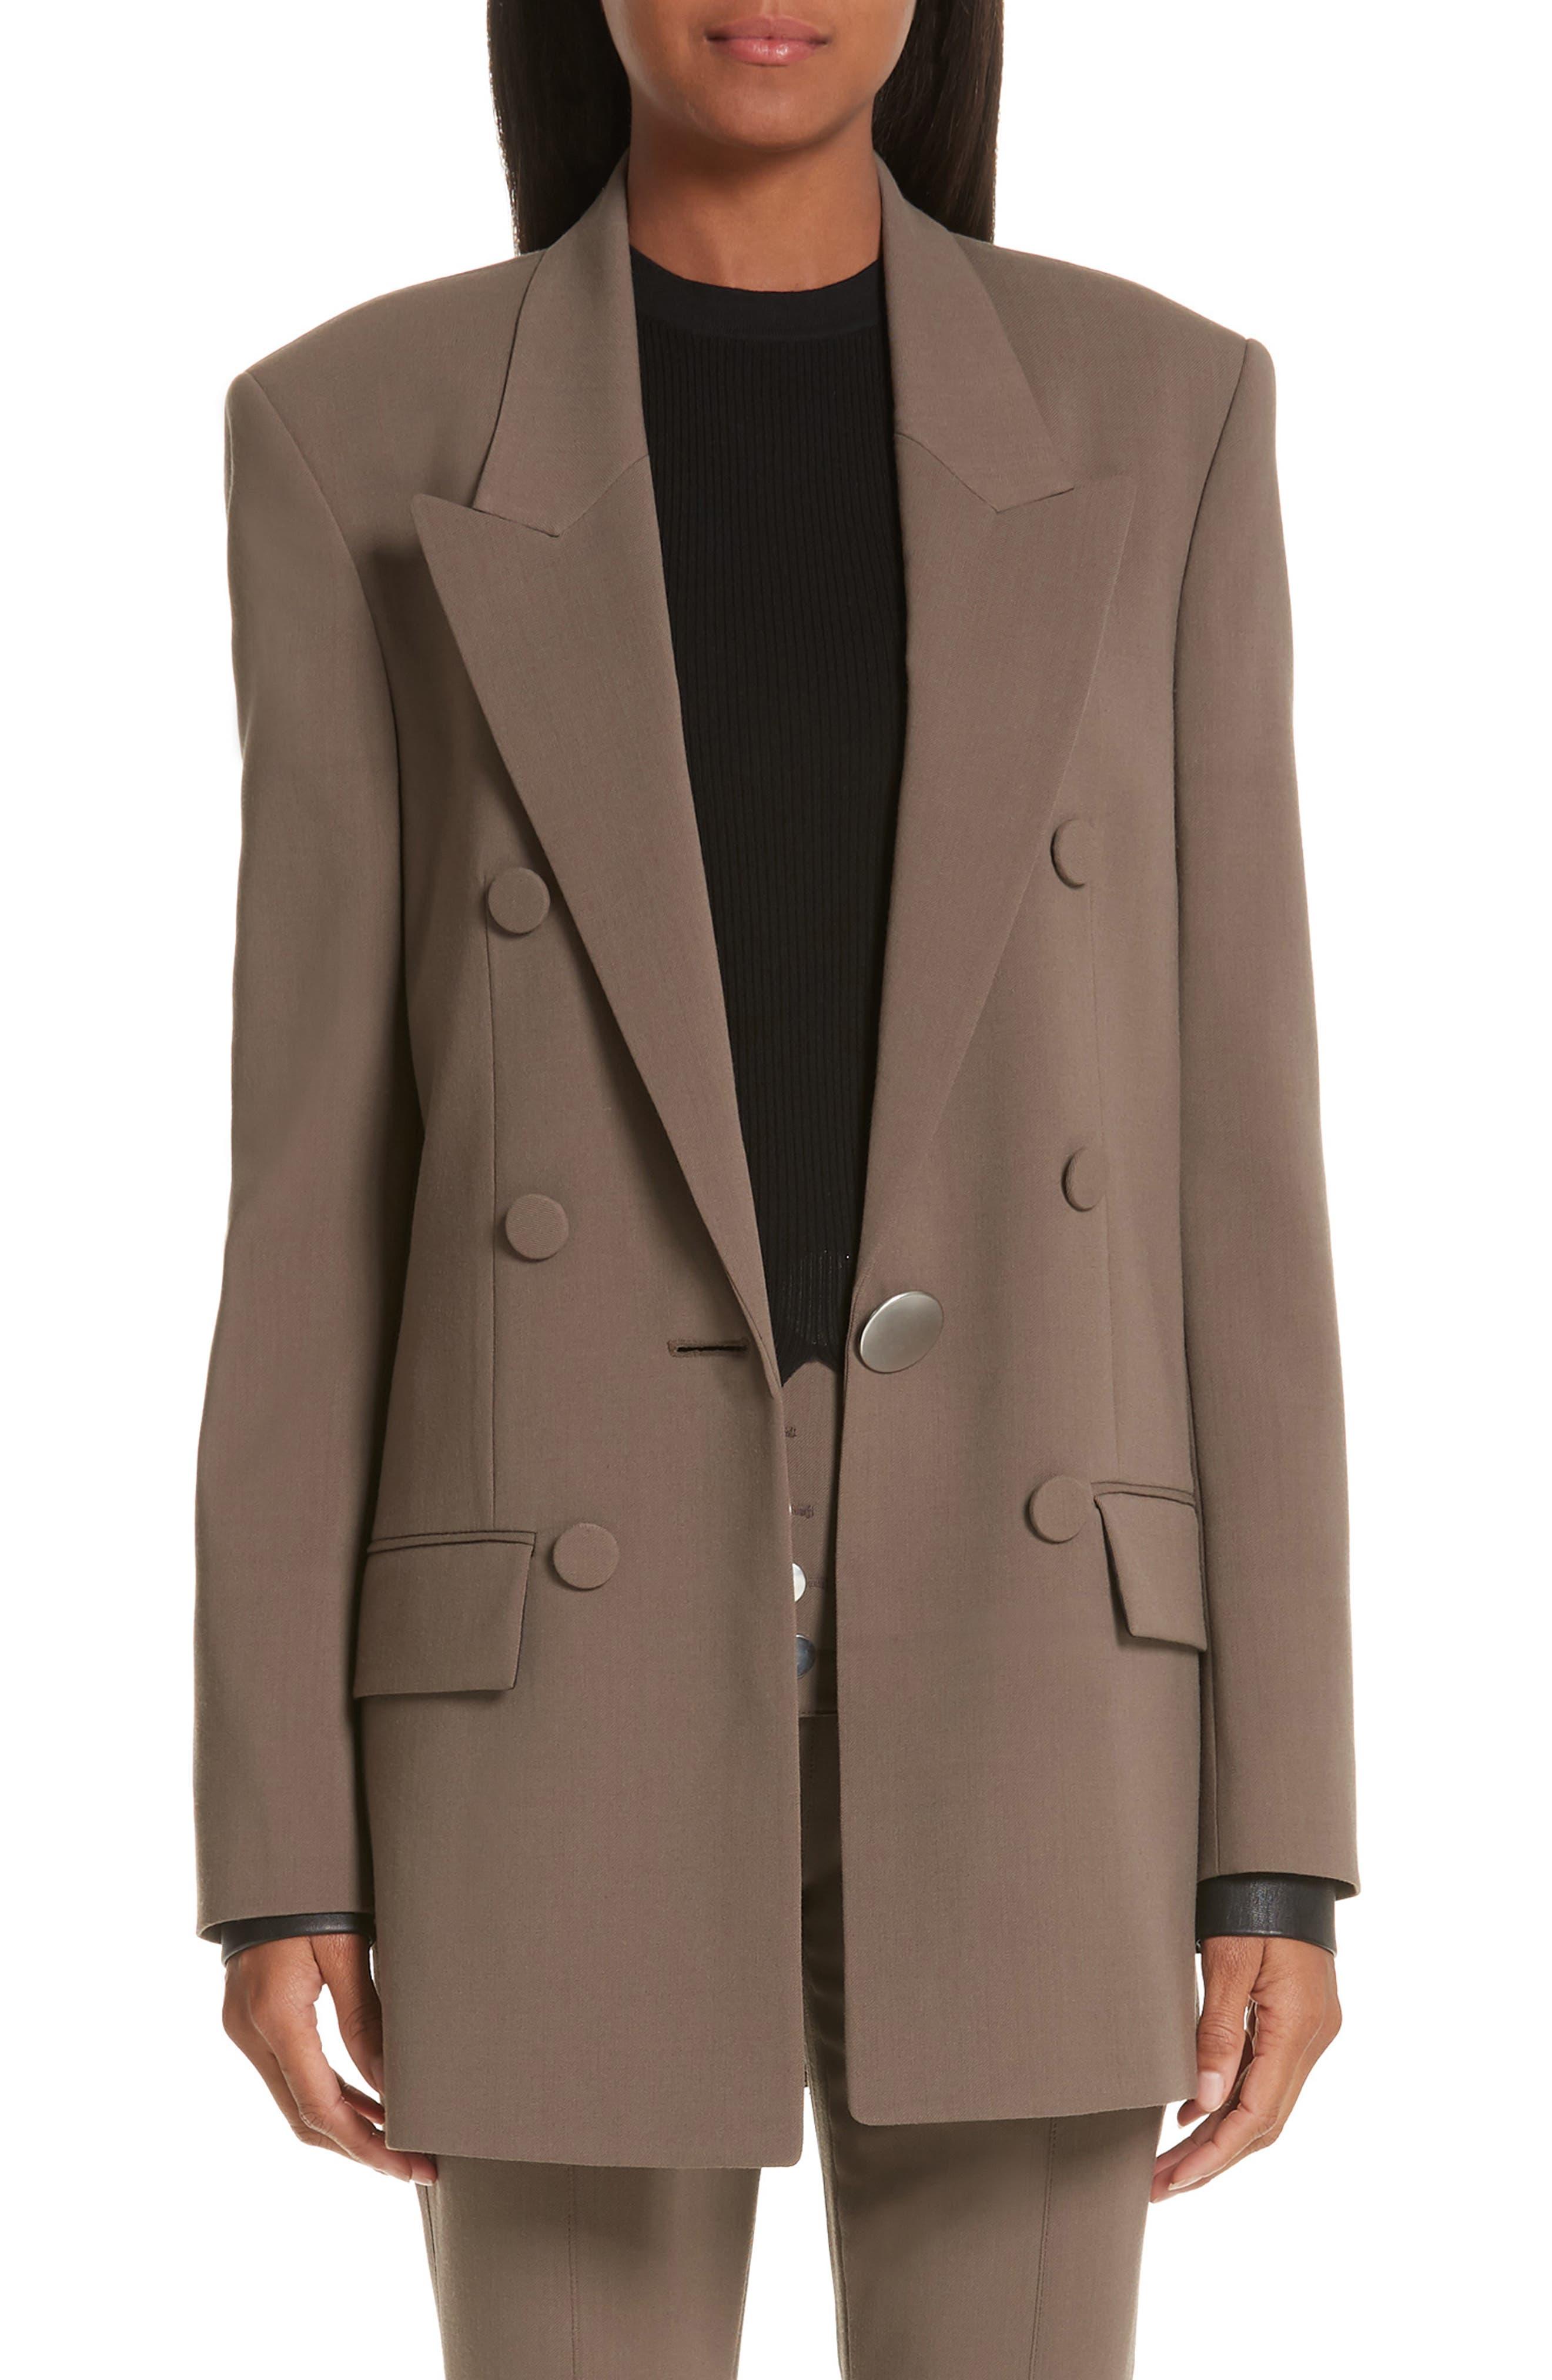 ALEXANDER WANG,                             Leather Cuff Blazer,                             Main thumbnail 1, color,                             KHAKI GREEN